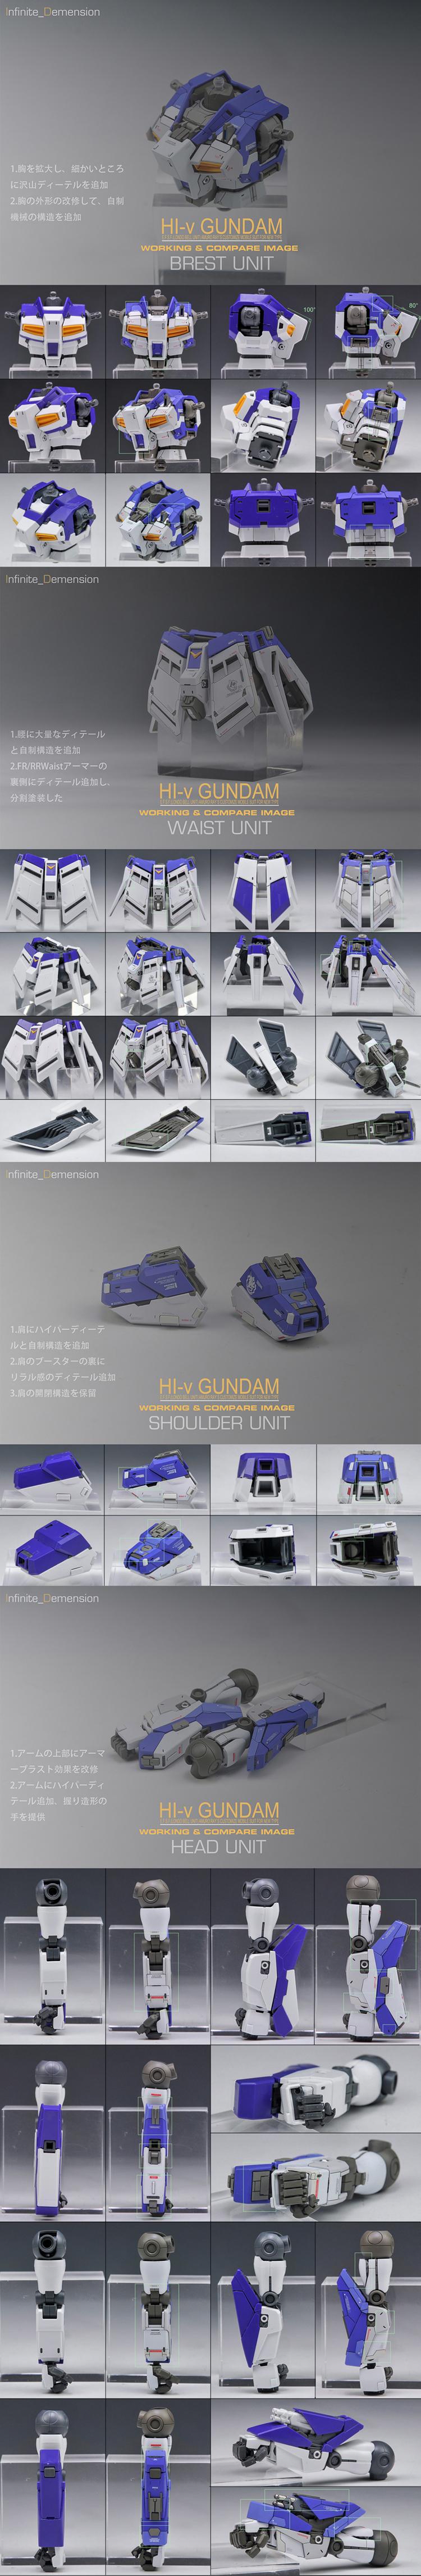 G91-mg-hi-nu-vsproject-info1-inask-004.jpg